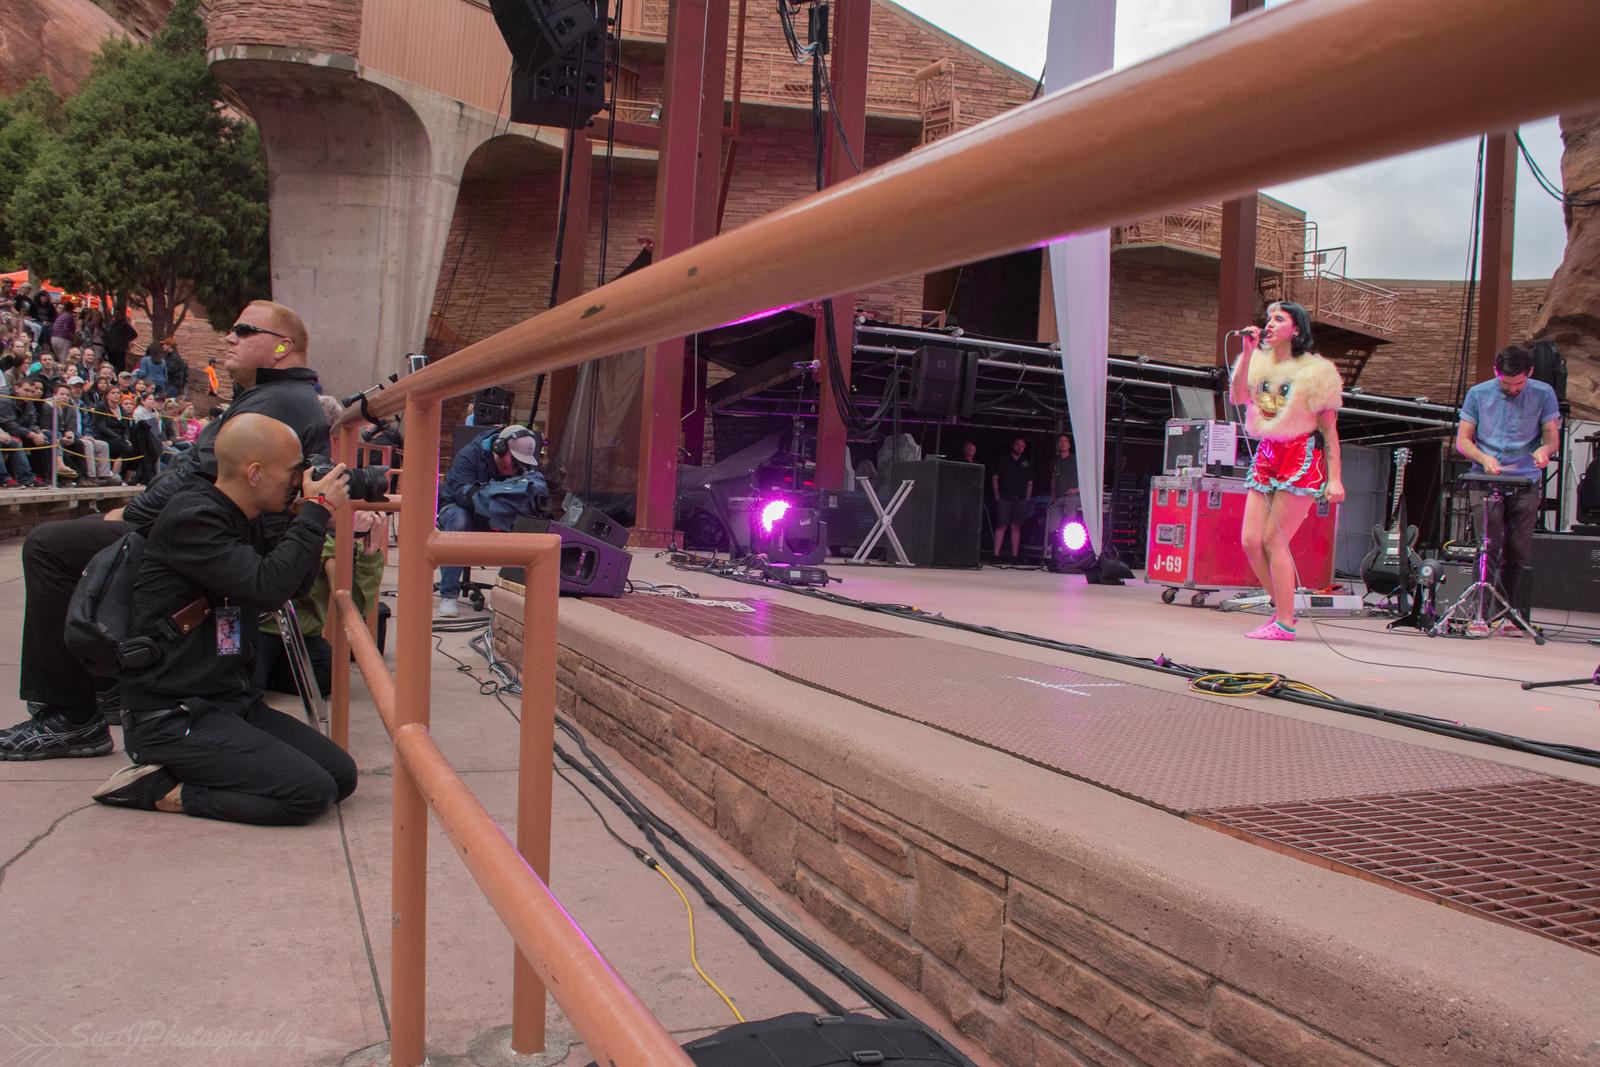 Adam Elmakias Photographing Melanie Martinez Live at Red Rocks Amphitheater